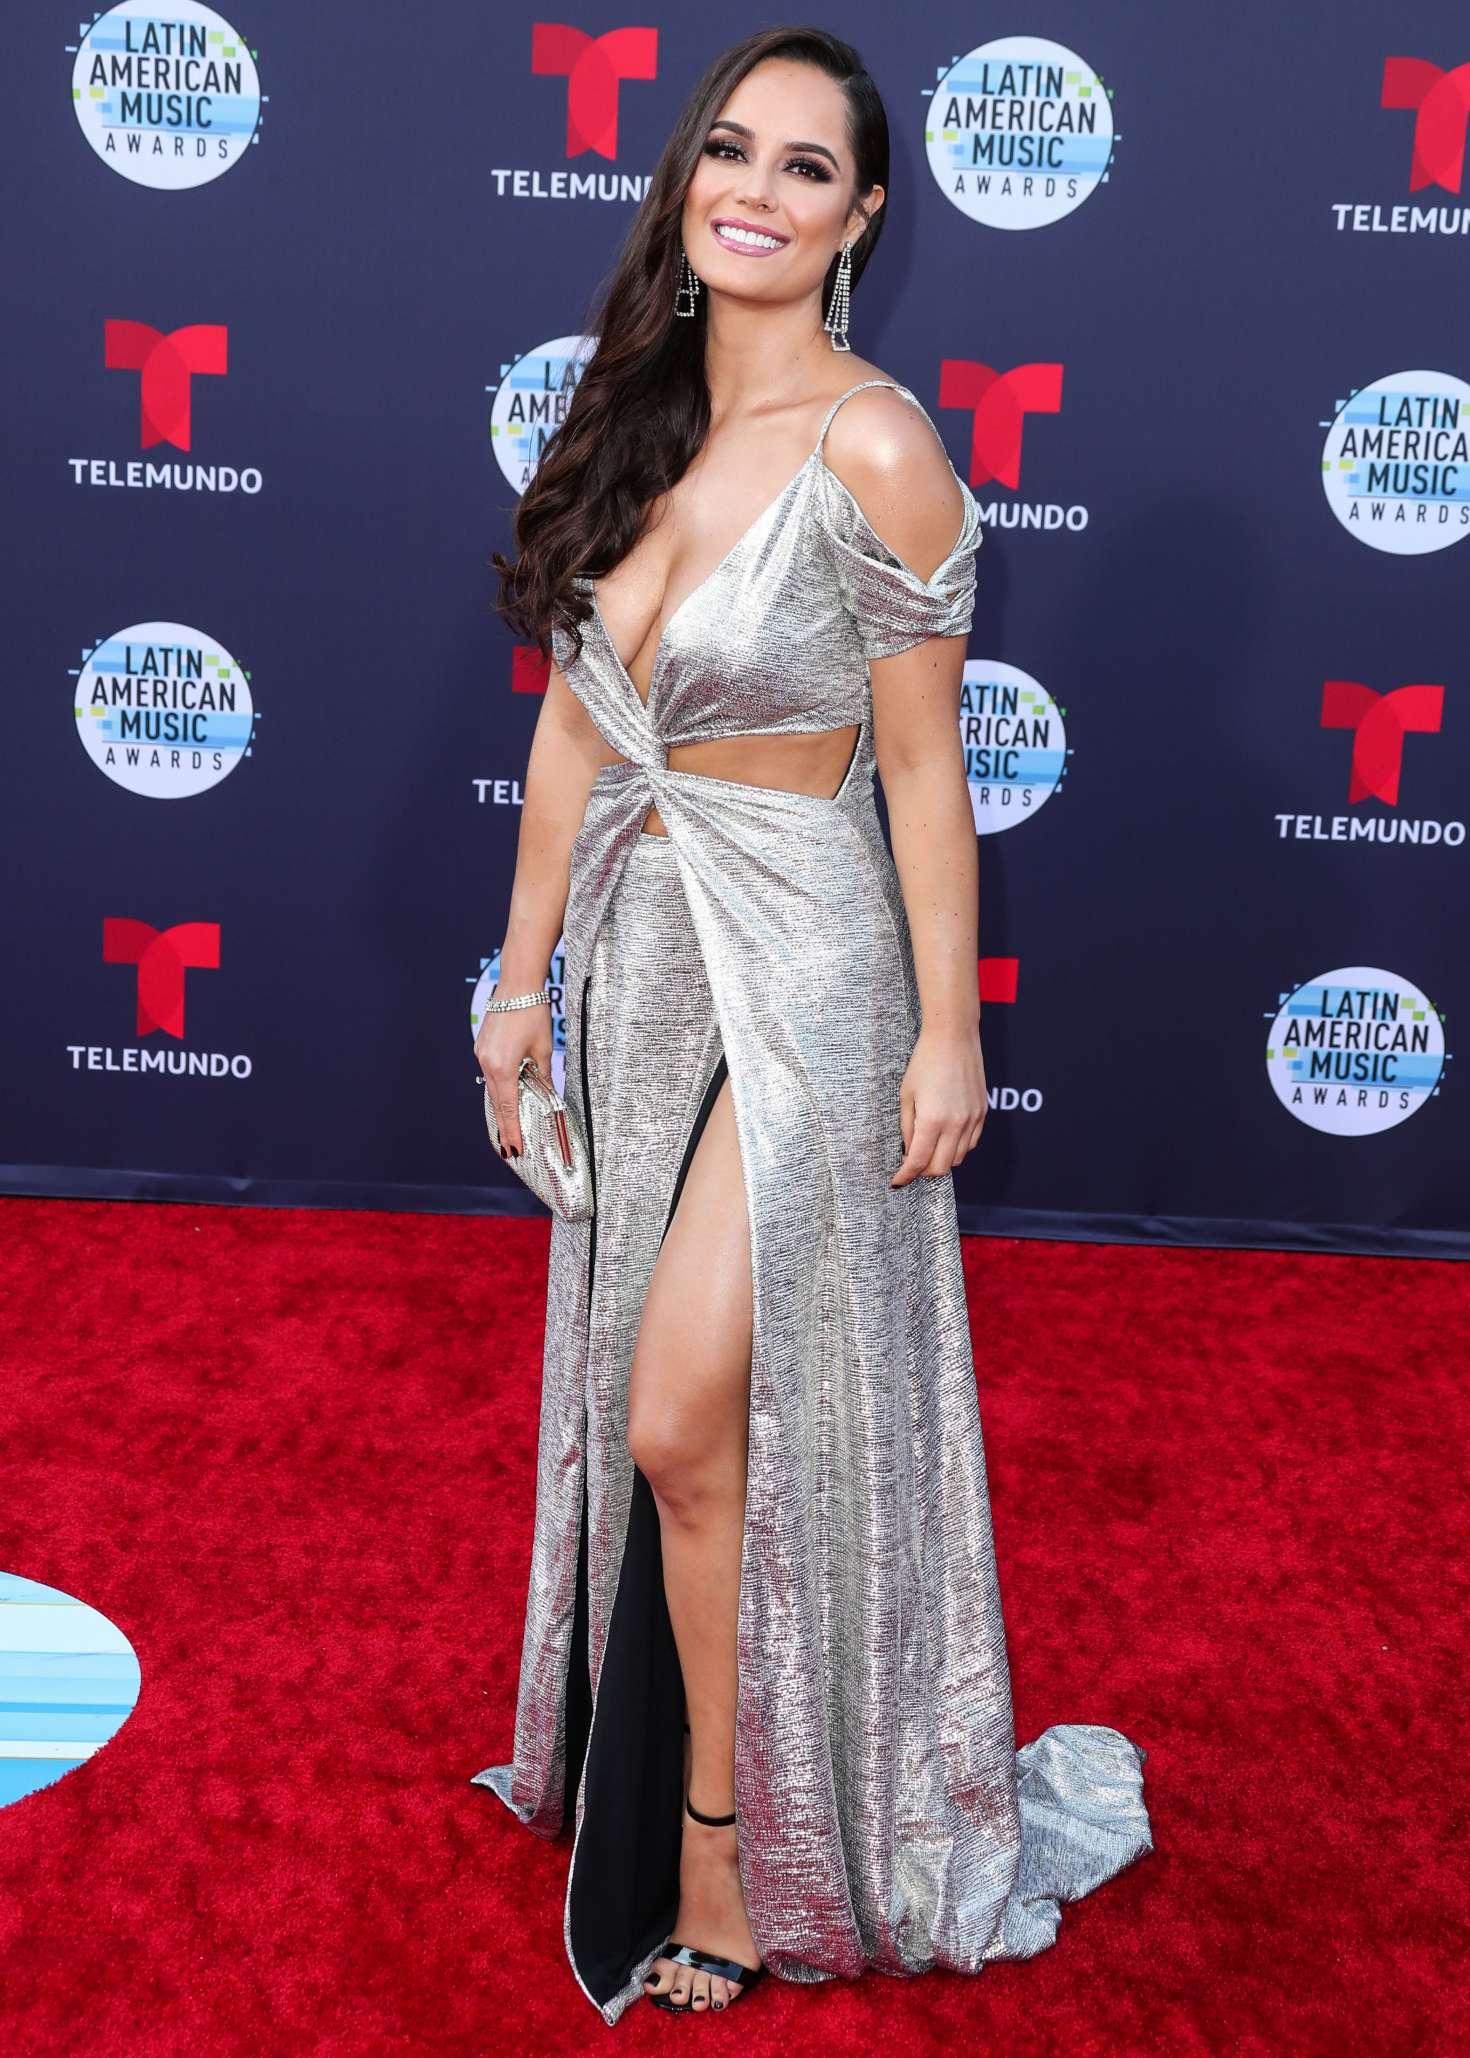 Ana Lucia Dominguez 2018 : Ana Lucia Dominguez: 2018 Latin American Music Awards -05